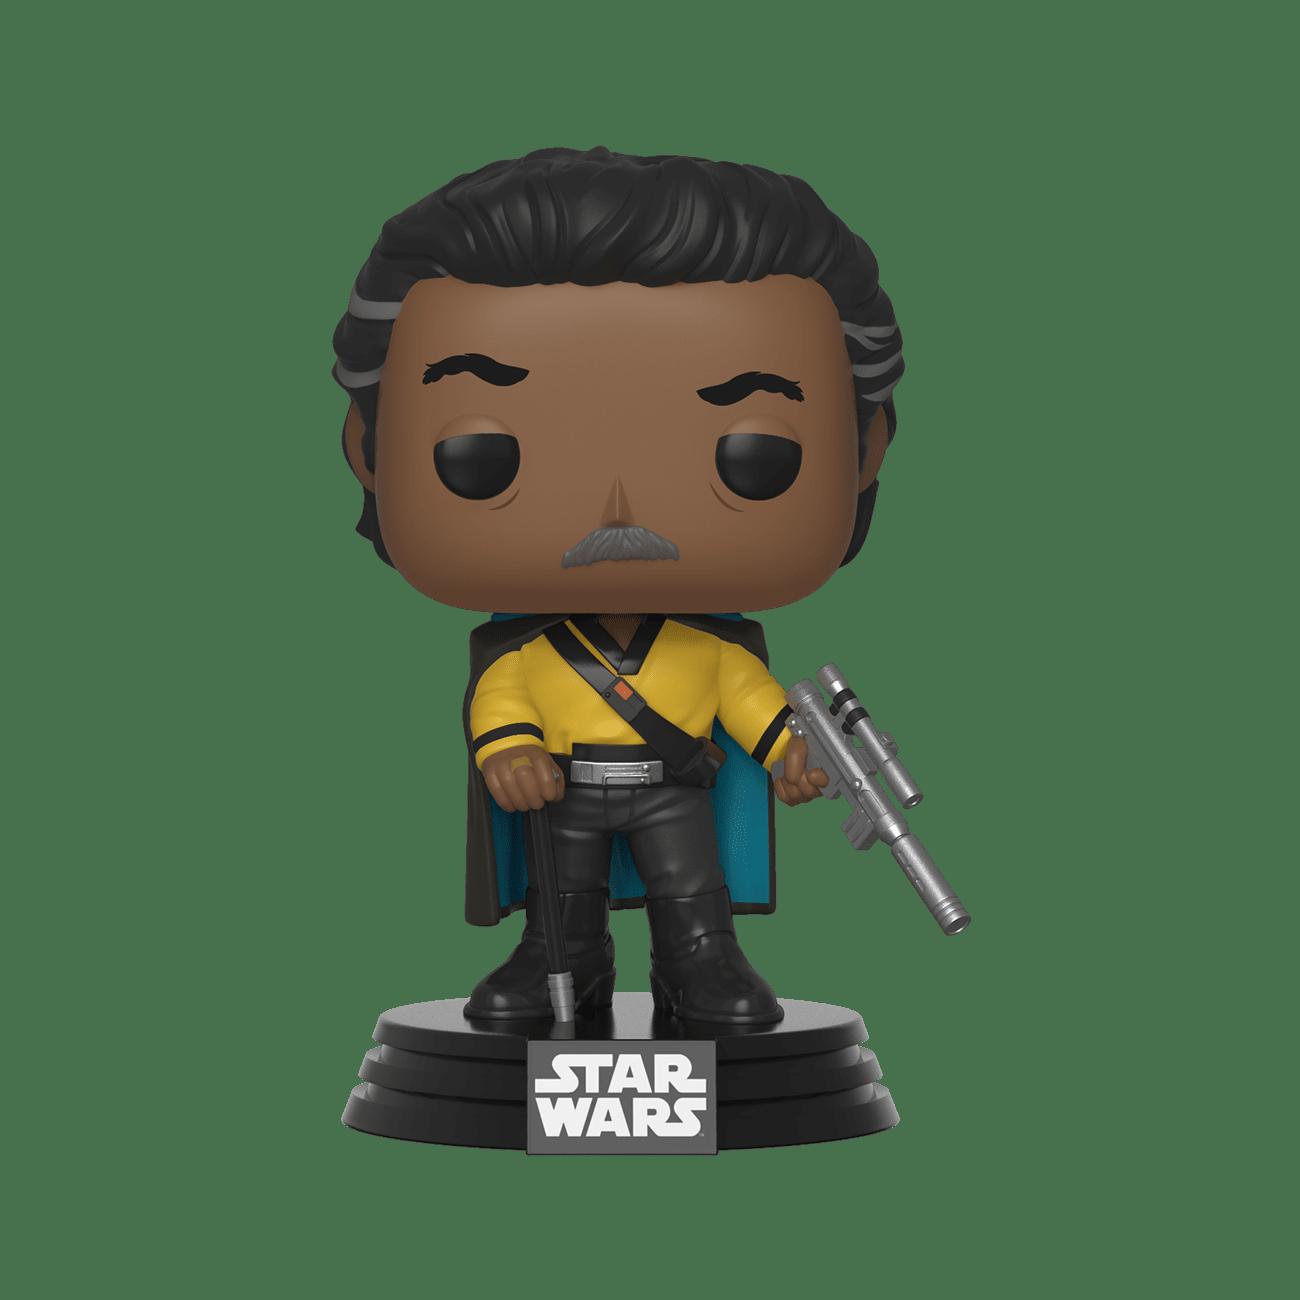 Star Wars: The Rise of Skywalker Lando Calrissian Pop!  Vinyl Figure